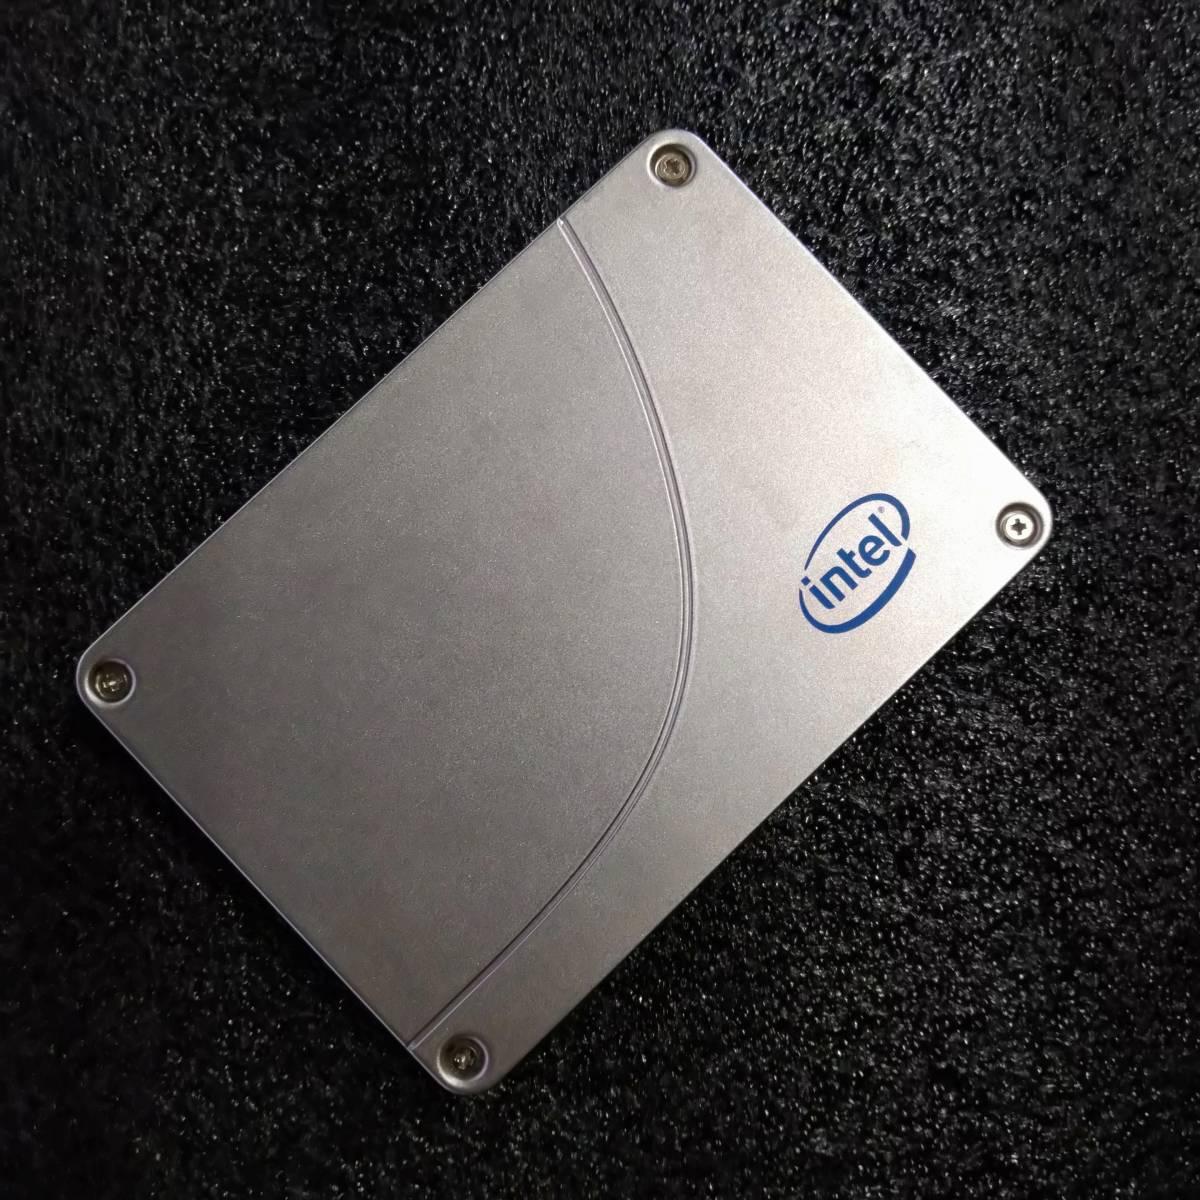 【中古】INTEL 335シリーズ 240GB SSDSC2CT240A4K5 MLC_画像1